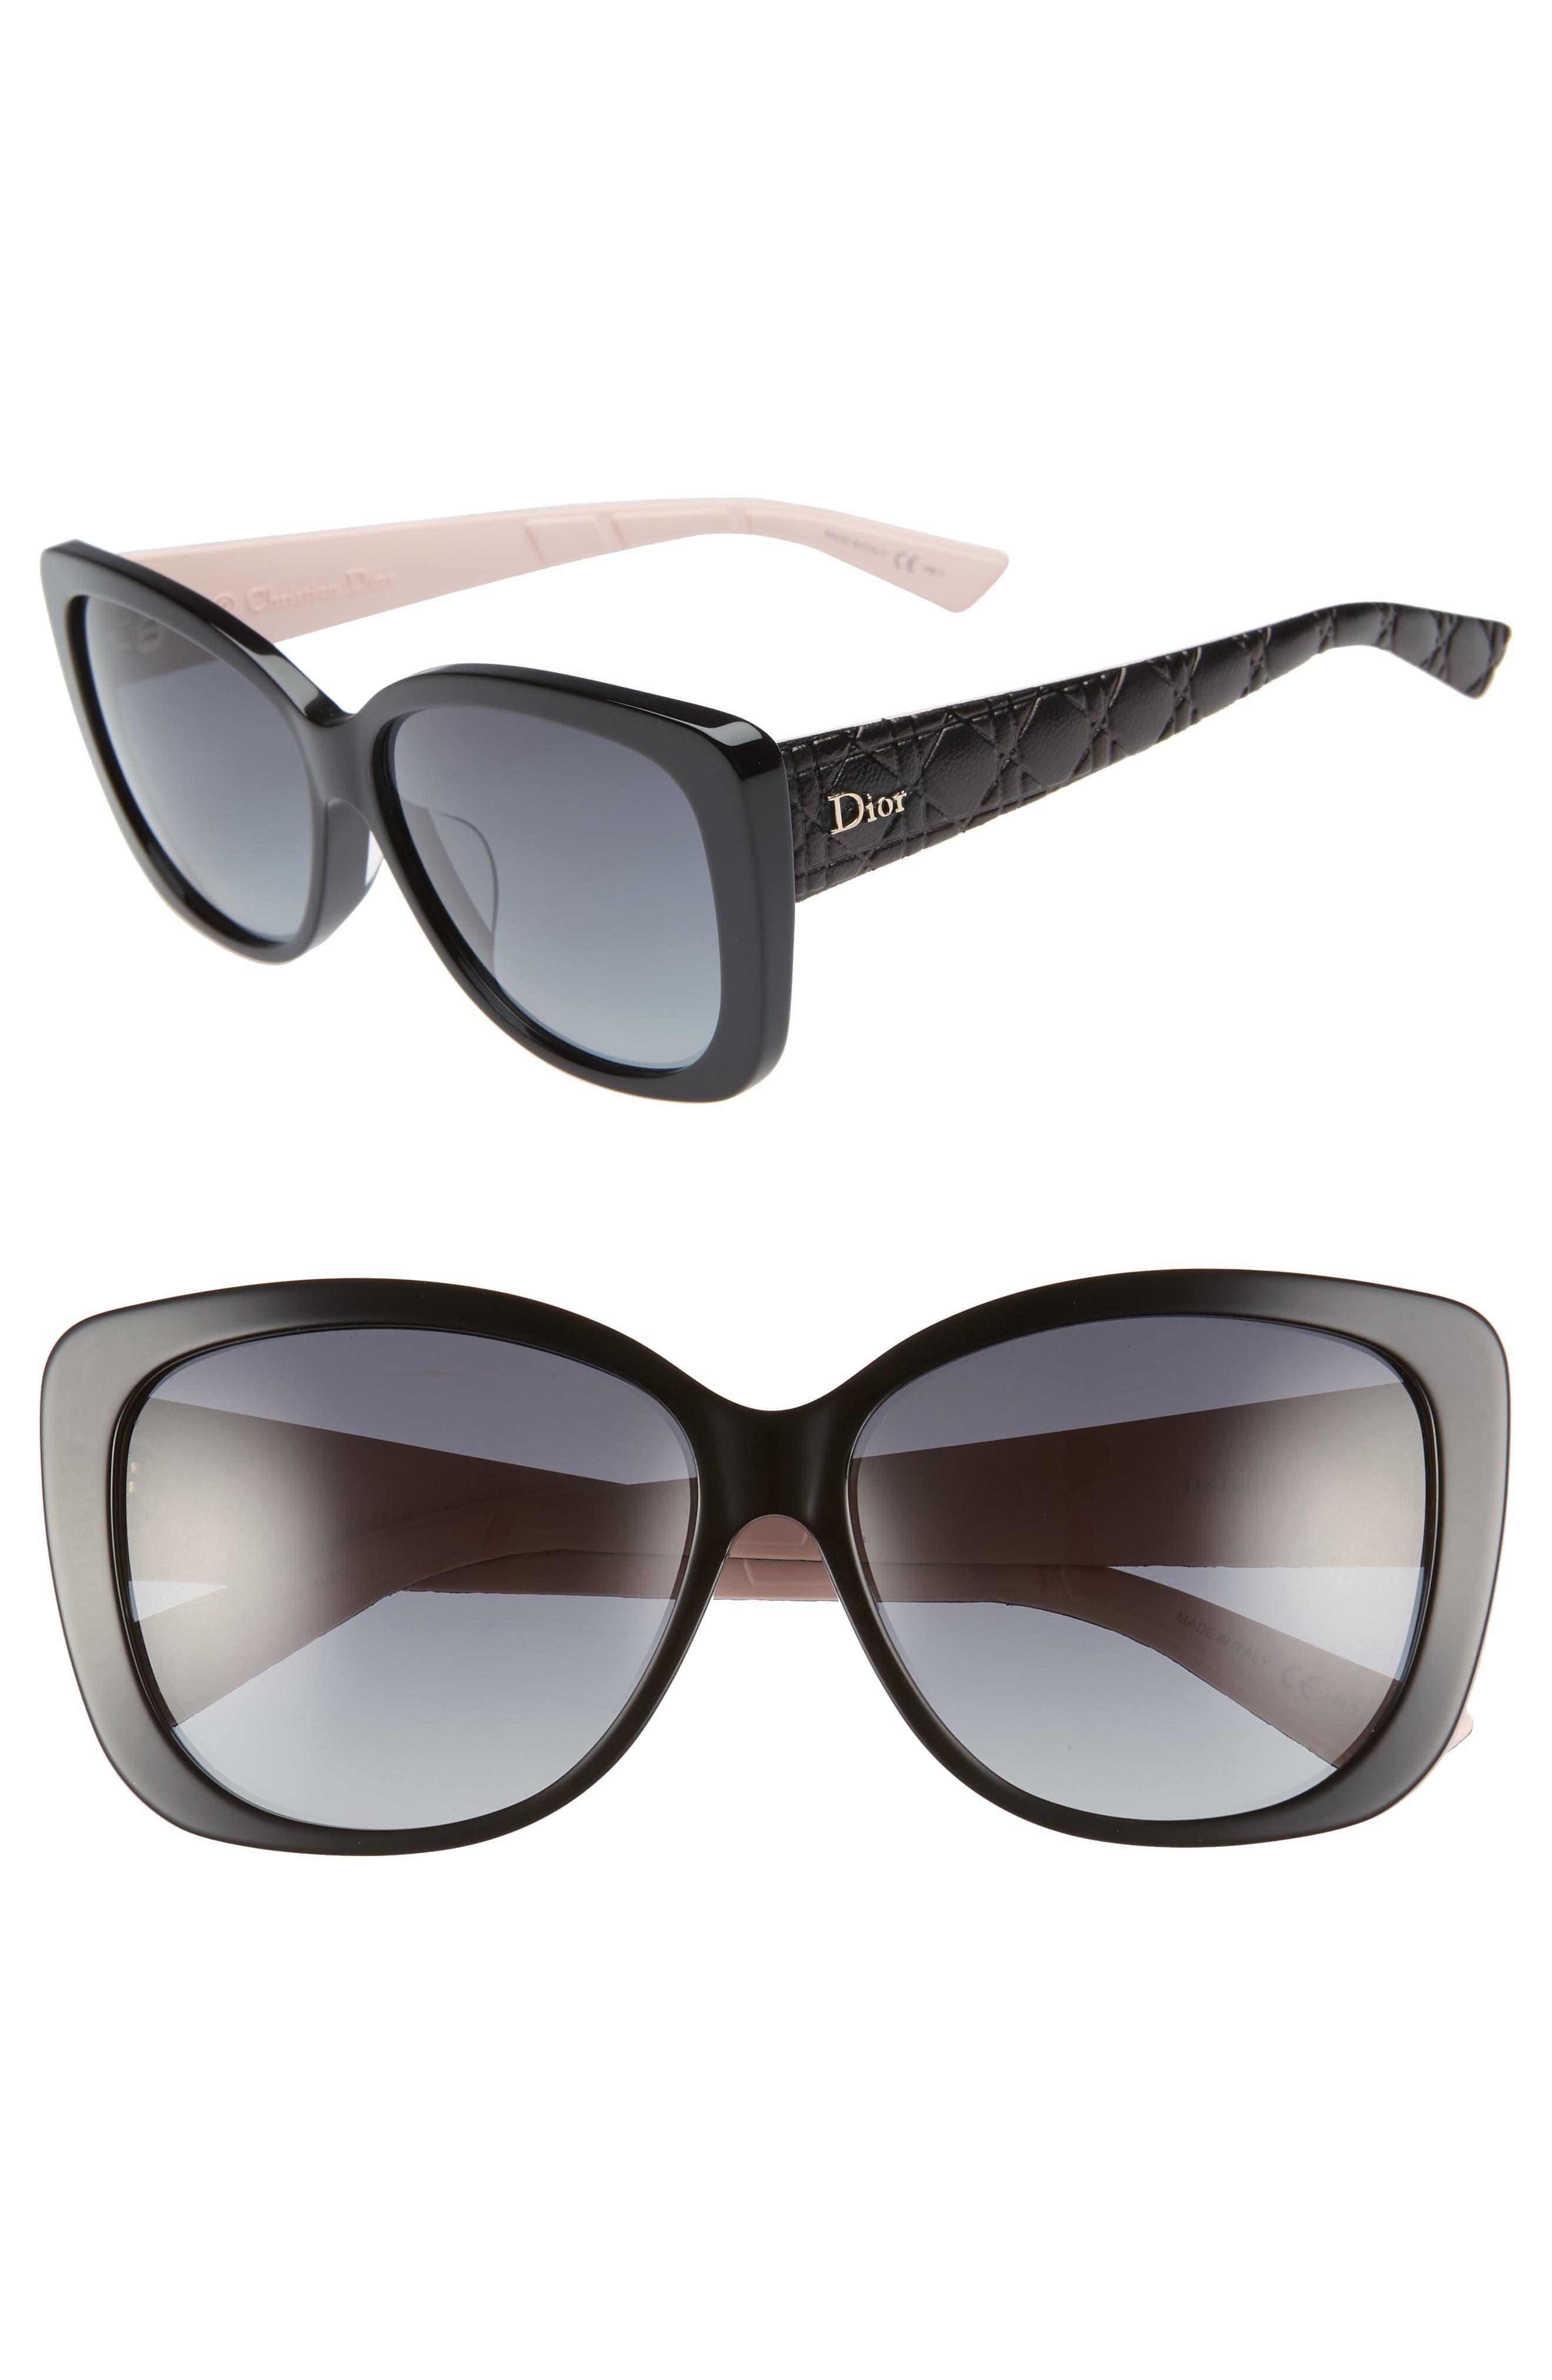 5511e9238ea DIOR TECHNOLOGIC GOLD  BLACK Sunglasses. EAN-13 Barcode of UPC  762753701626. 762753701626